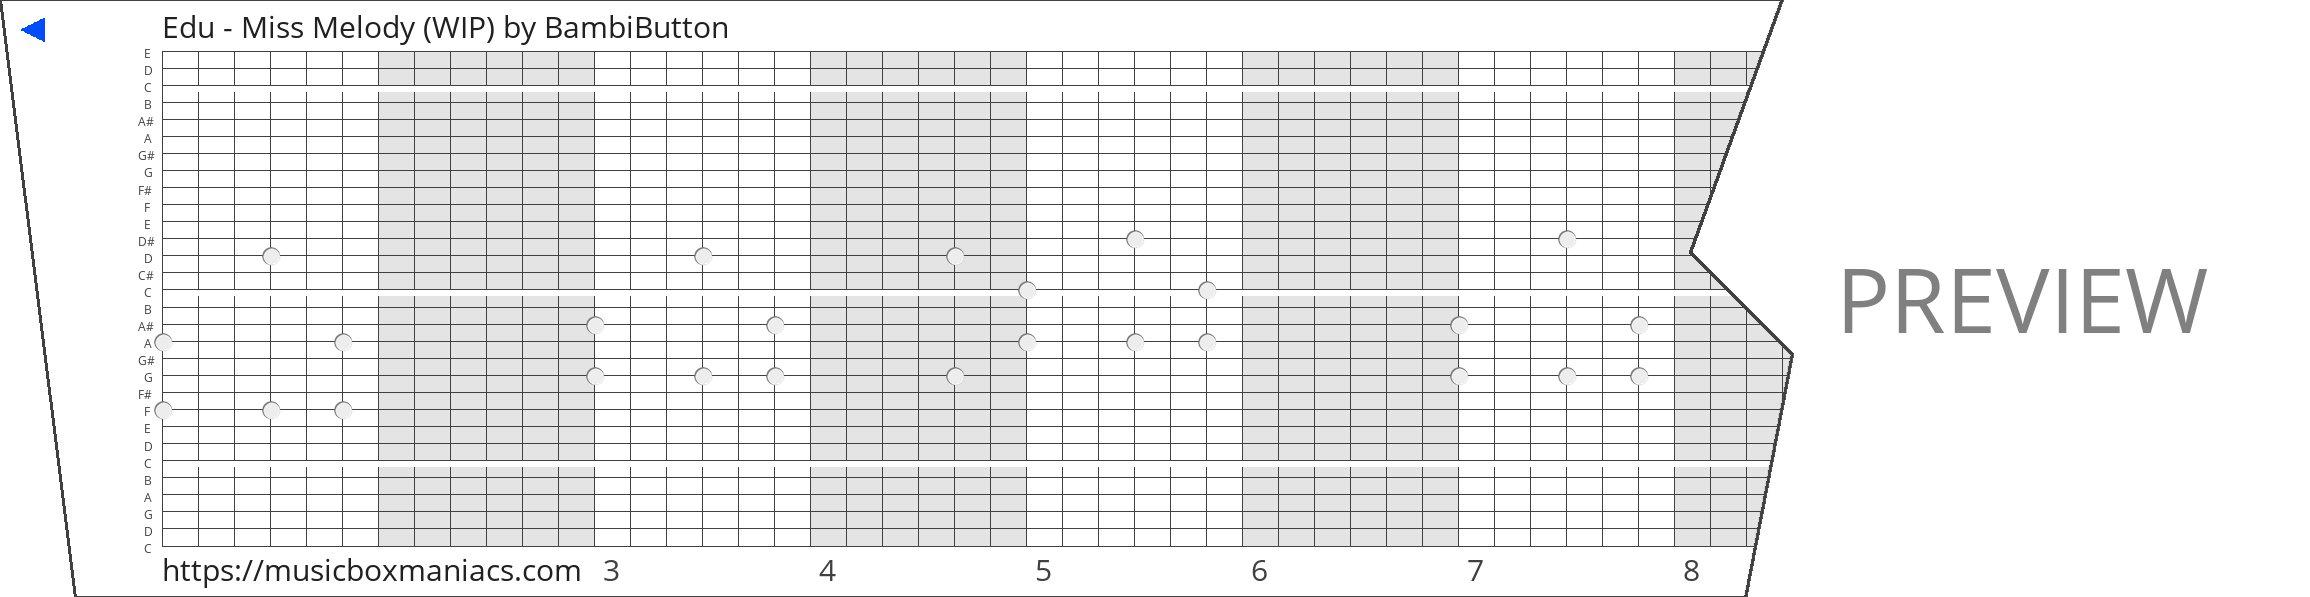 Edu - Miss Melody (WIP) 30 note music box paper strip